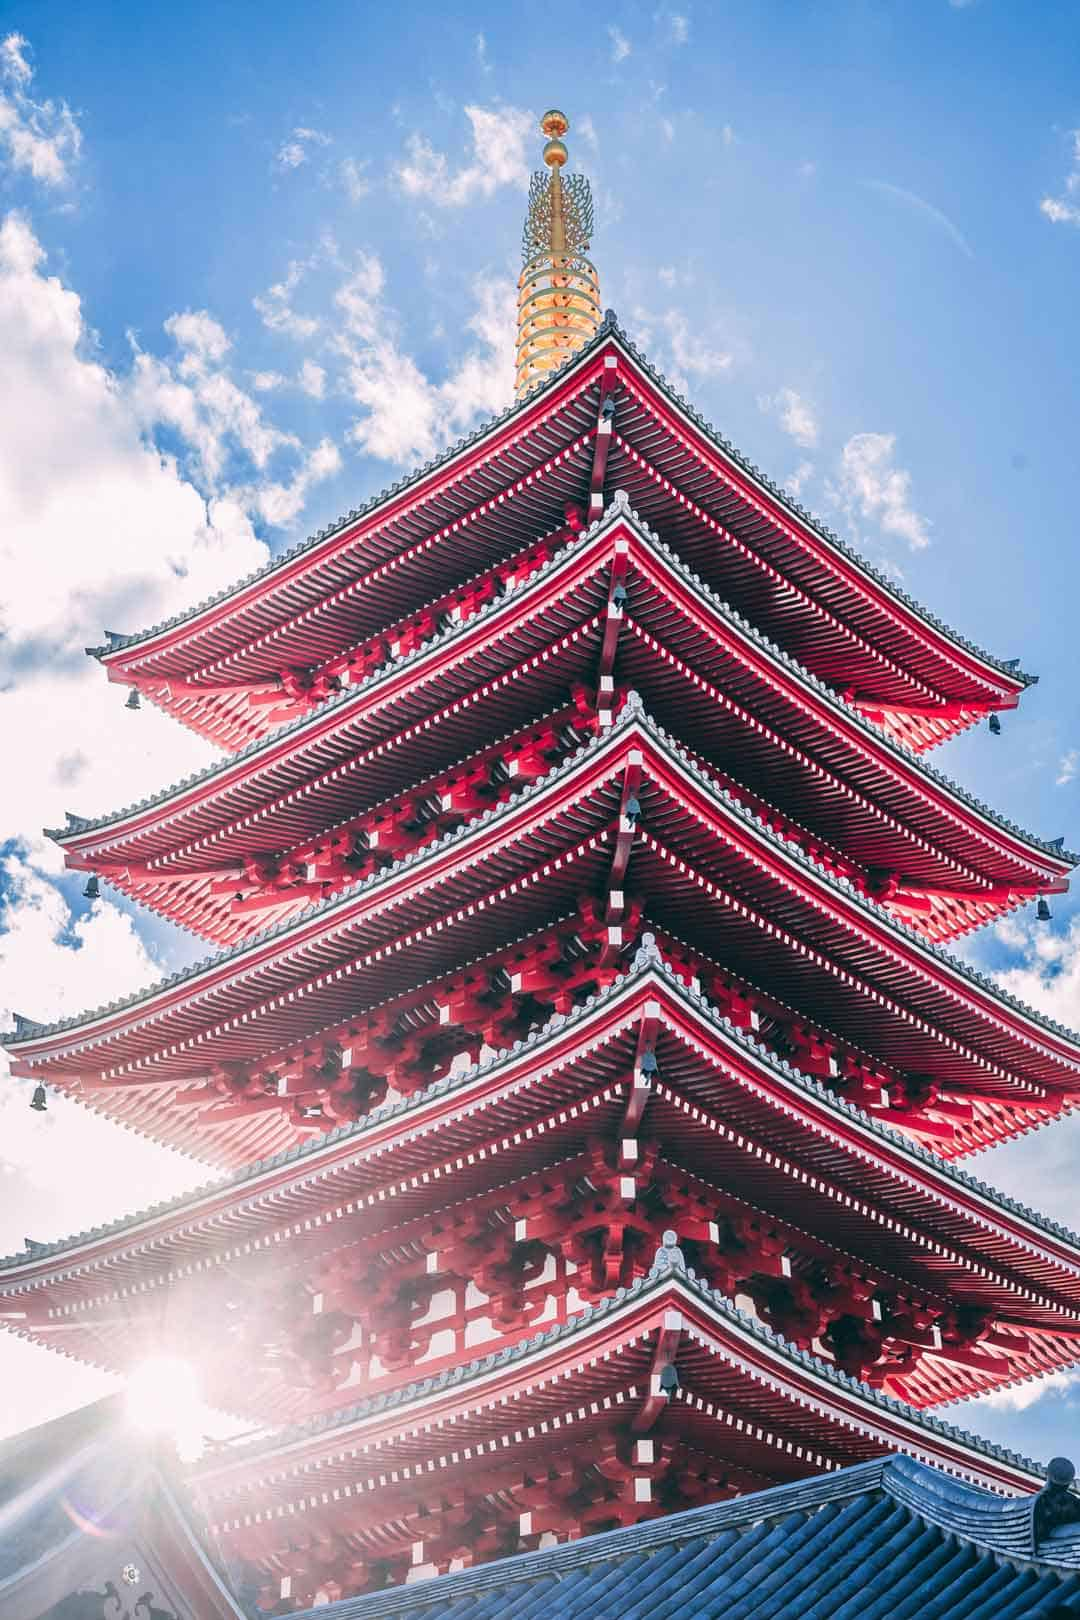 Sensoji Temple, Japan, Things To Do In Japan